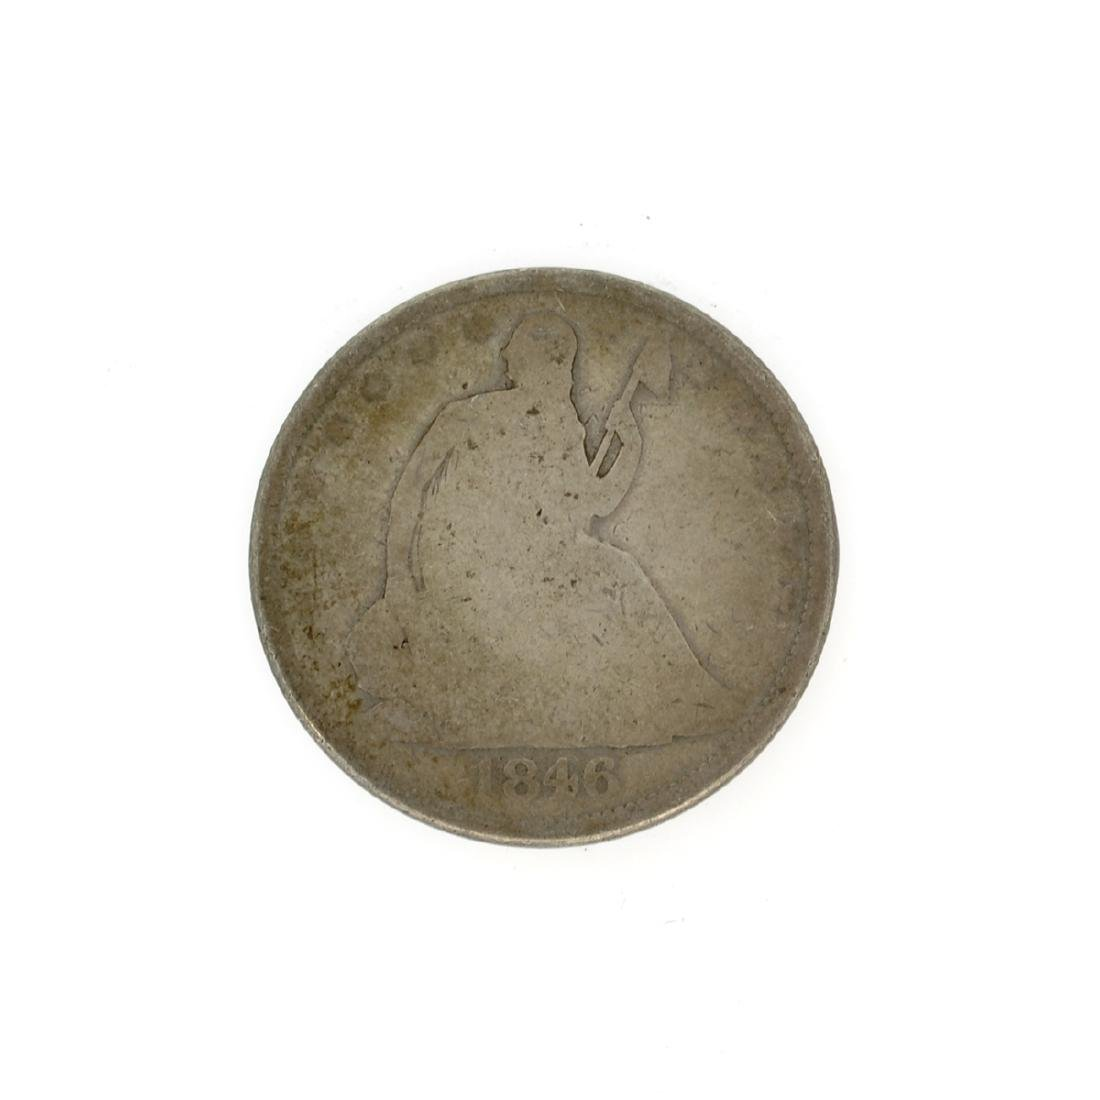 Rare 1846-O Liberty Seated Half Dollar Coin